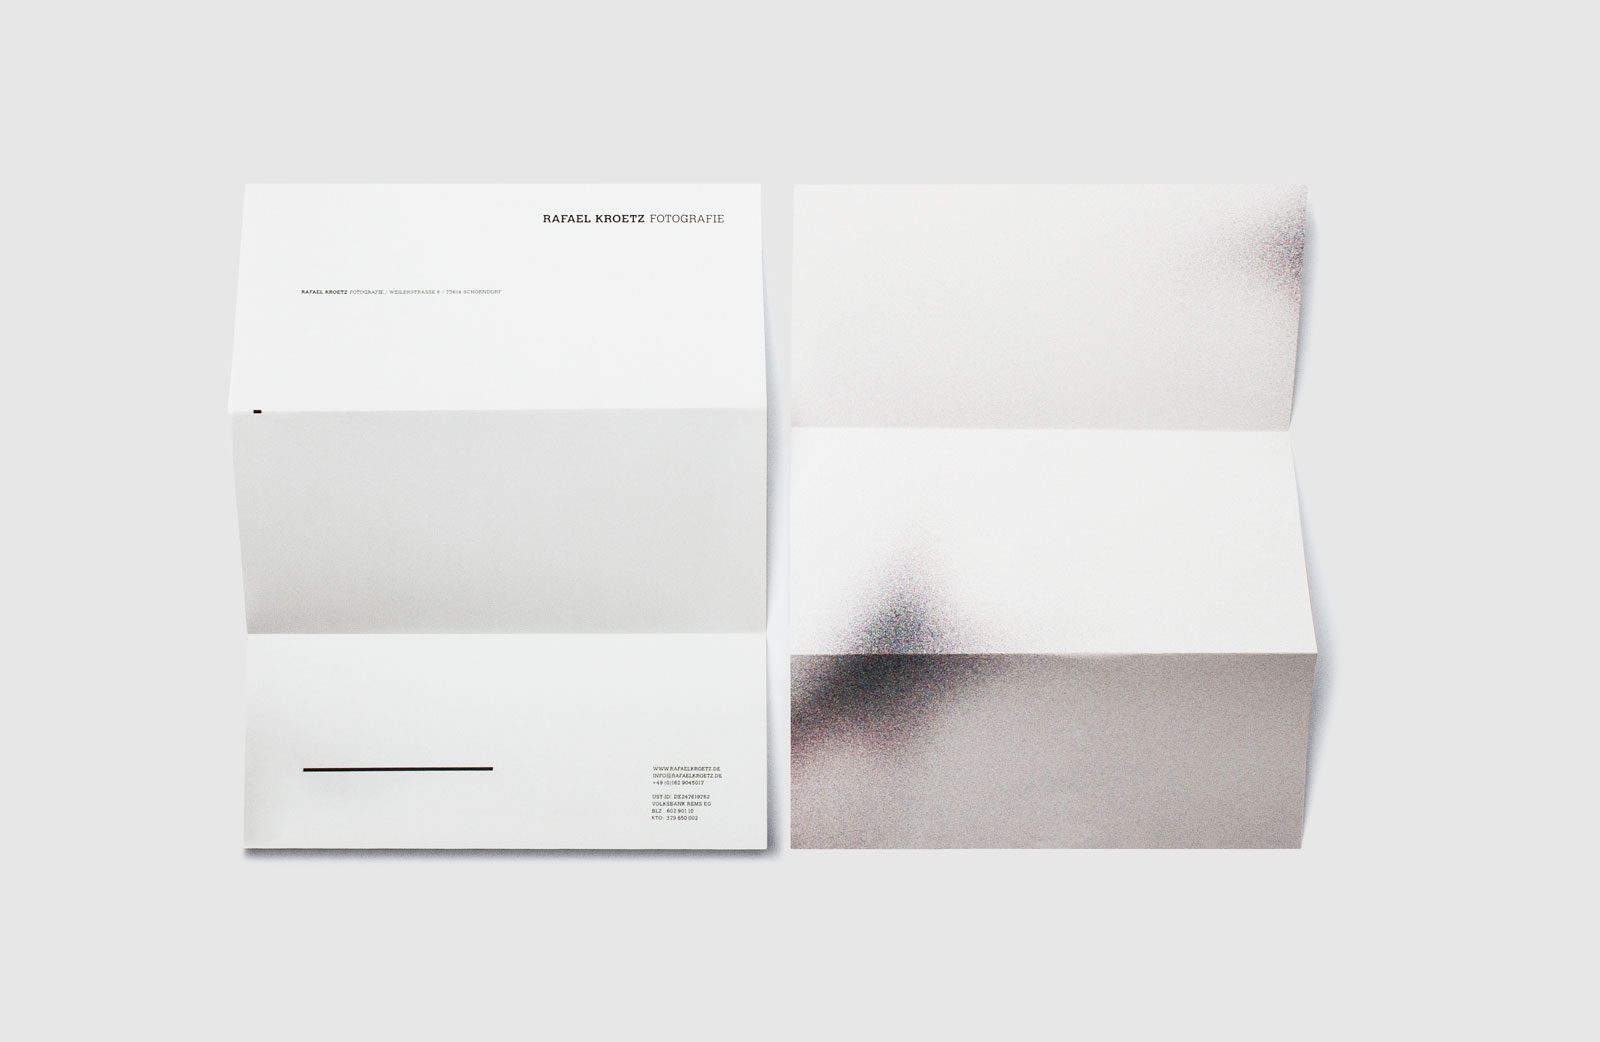 OLIVER MOORE Art Direction and Graphic Design  Idastrasse 17 13156 Berlin  studio@olivermoore.de +49 (0)30 40368971 Rafael Krötz corporate identity